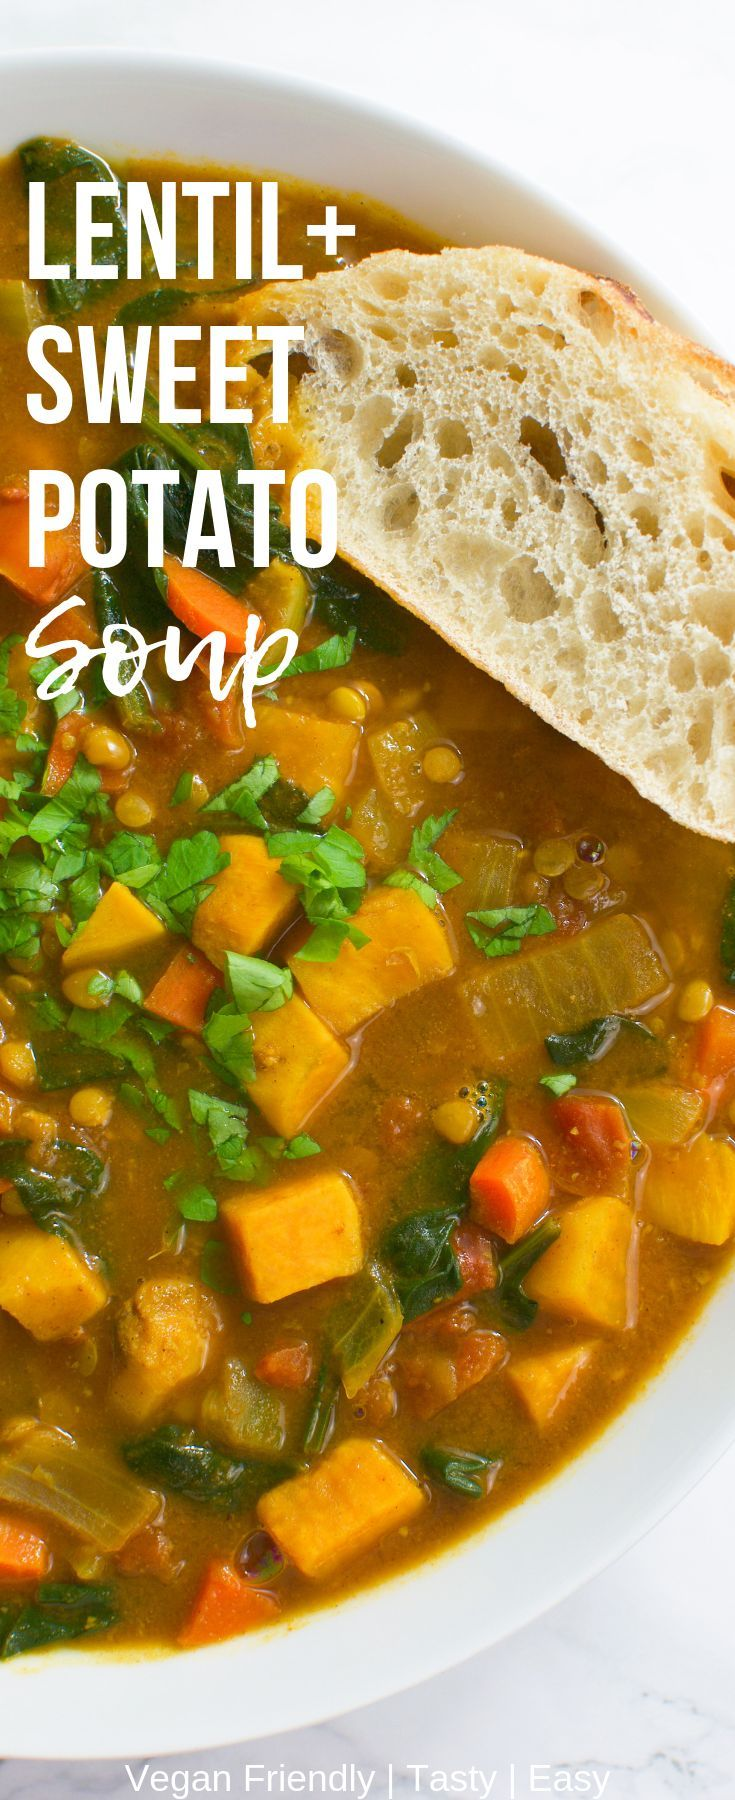 Lentil+Sweet Potato Soup | ICanYouCanVegan Lentil+Sweet Potato Soup